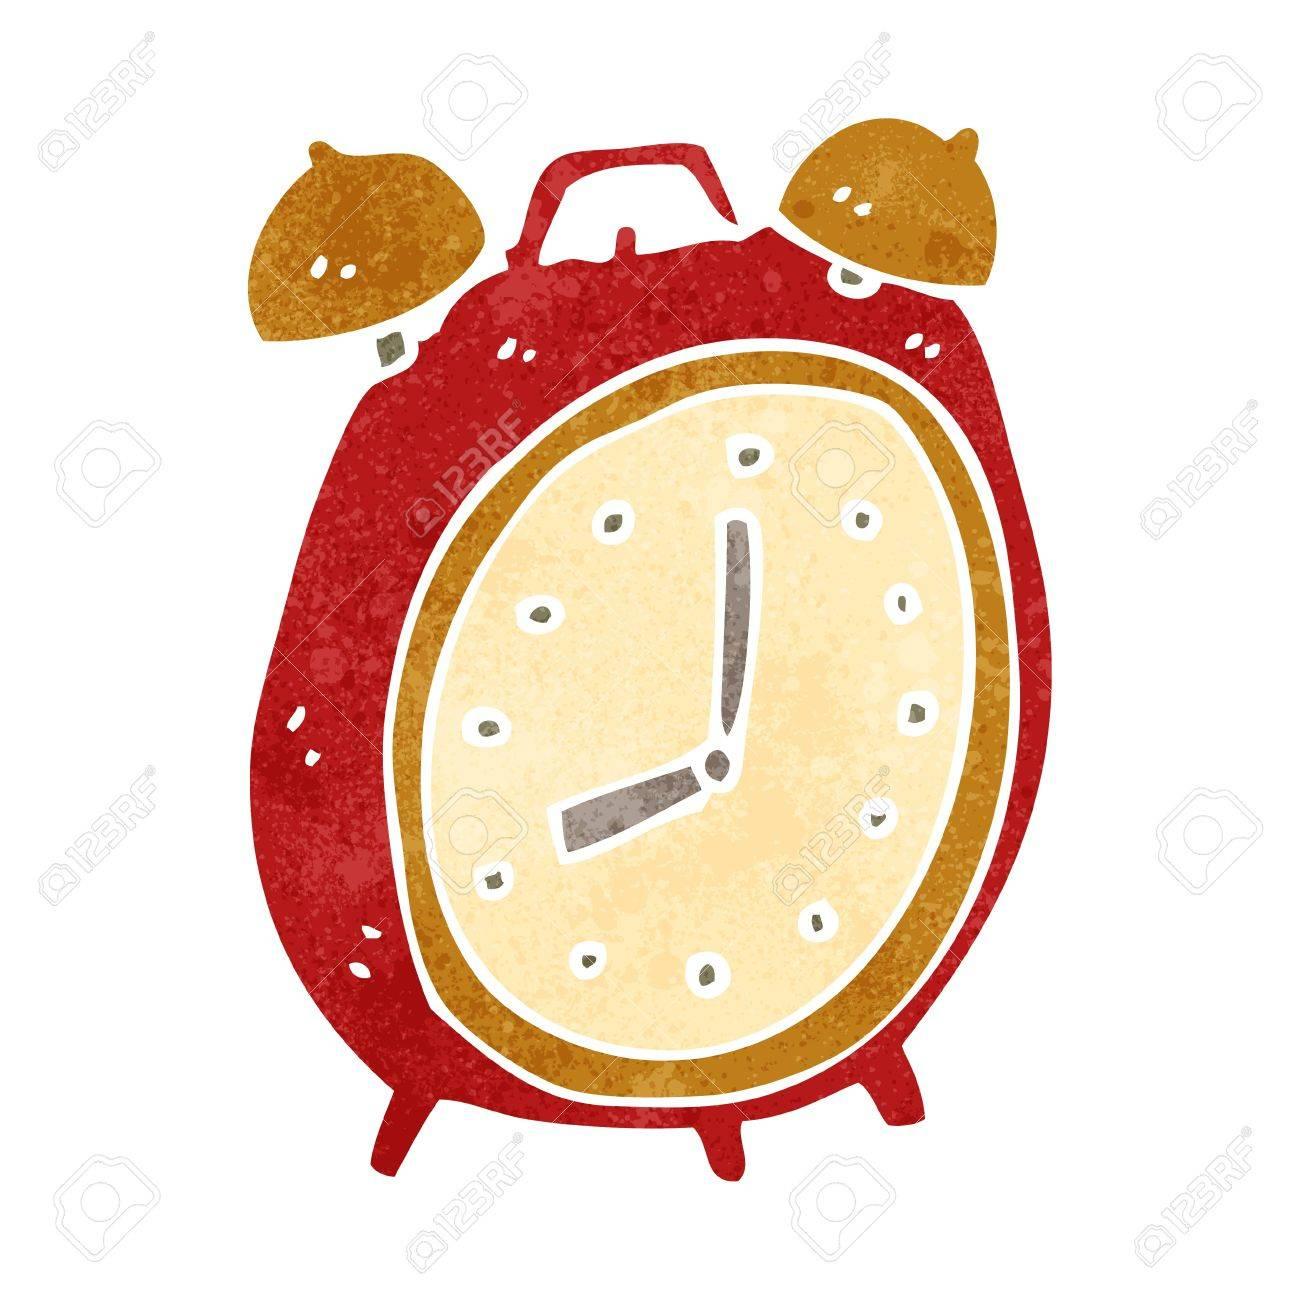 retro cartoon alarm clock - 22155432